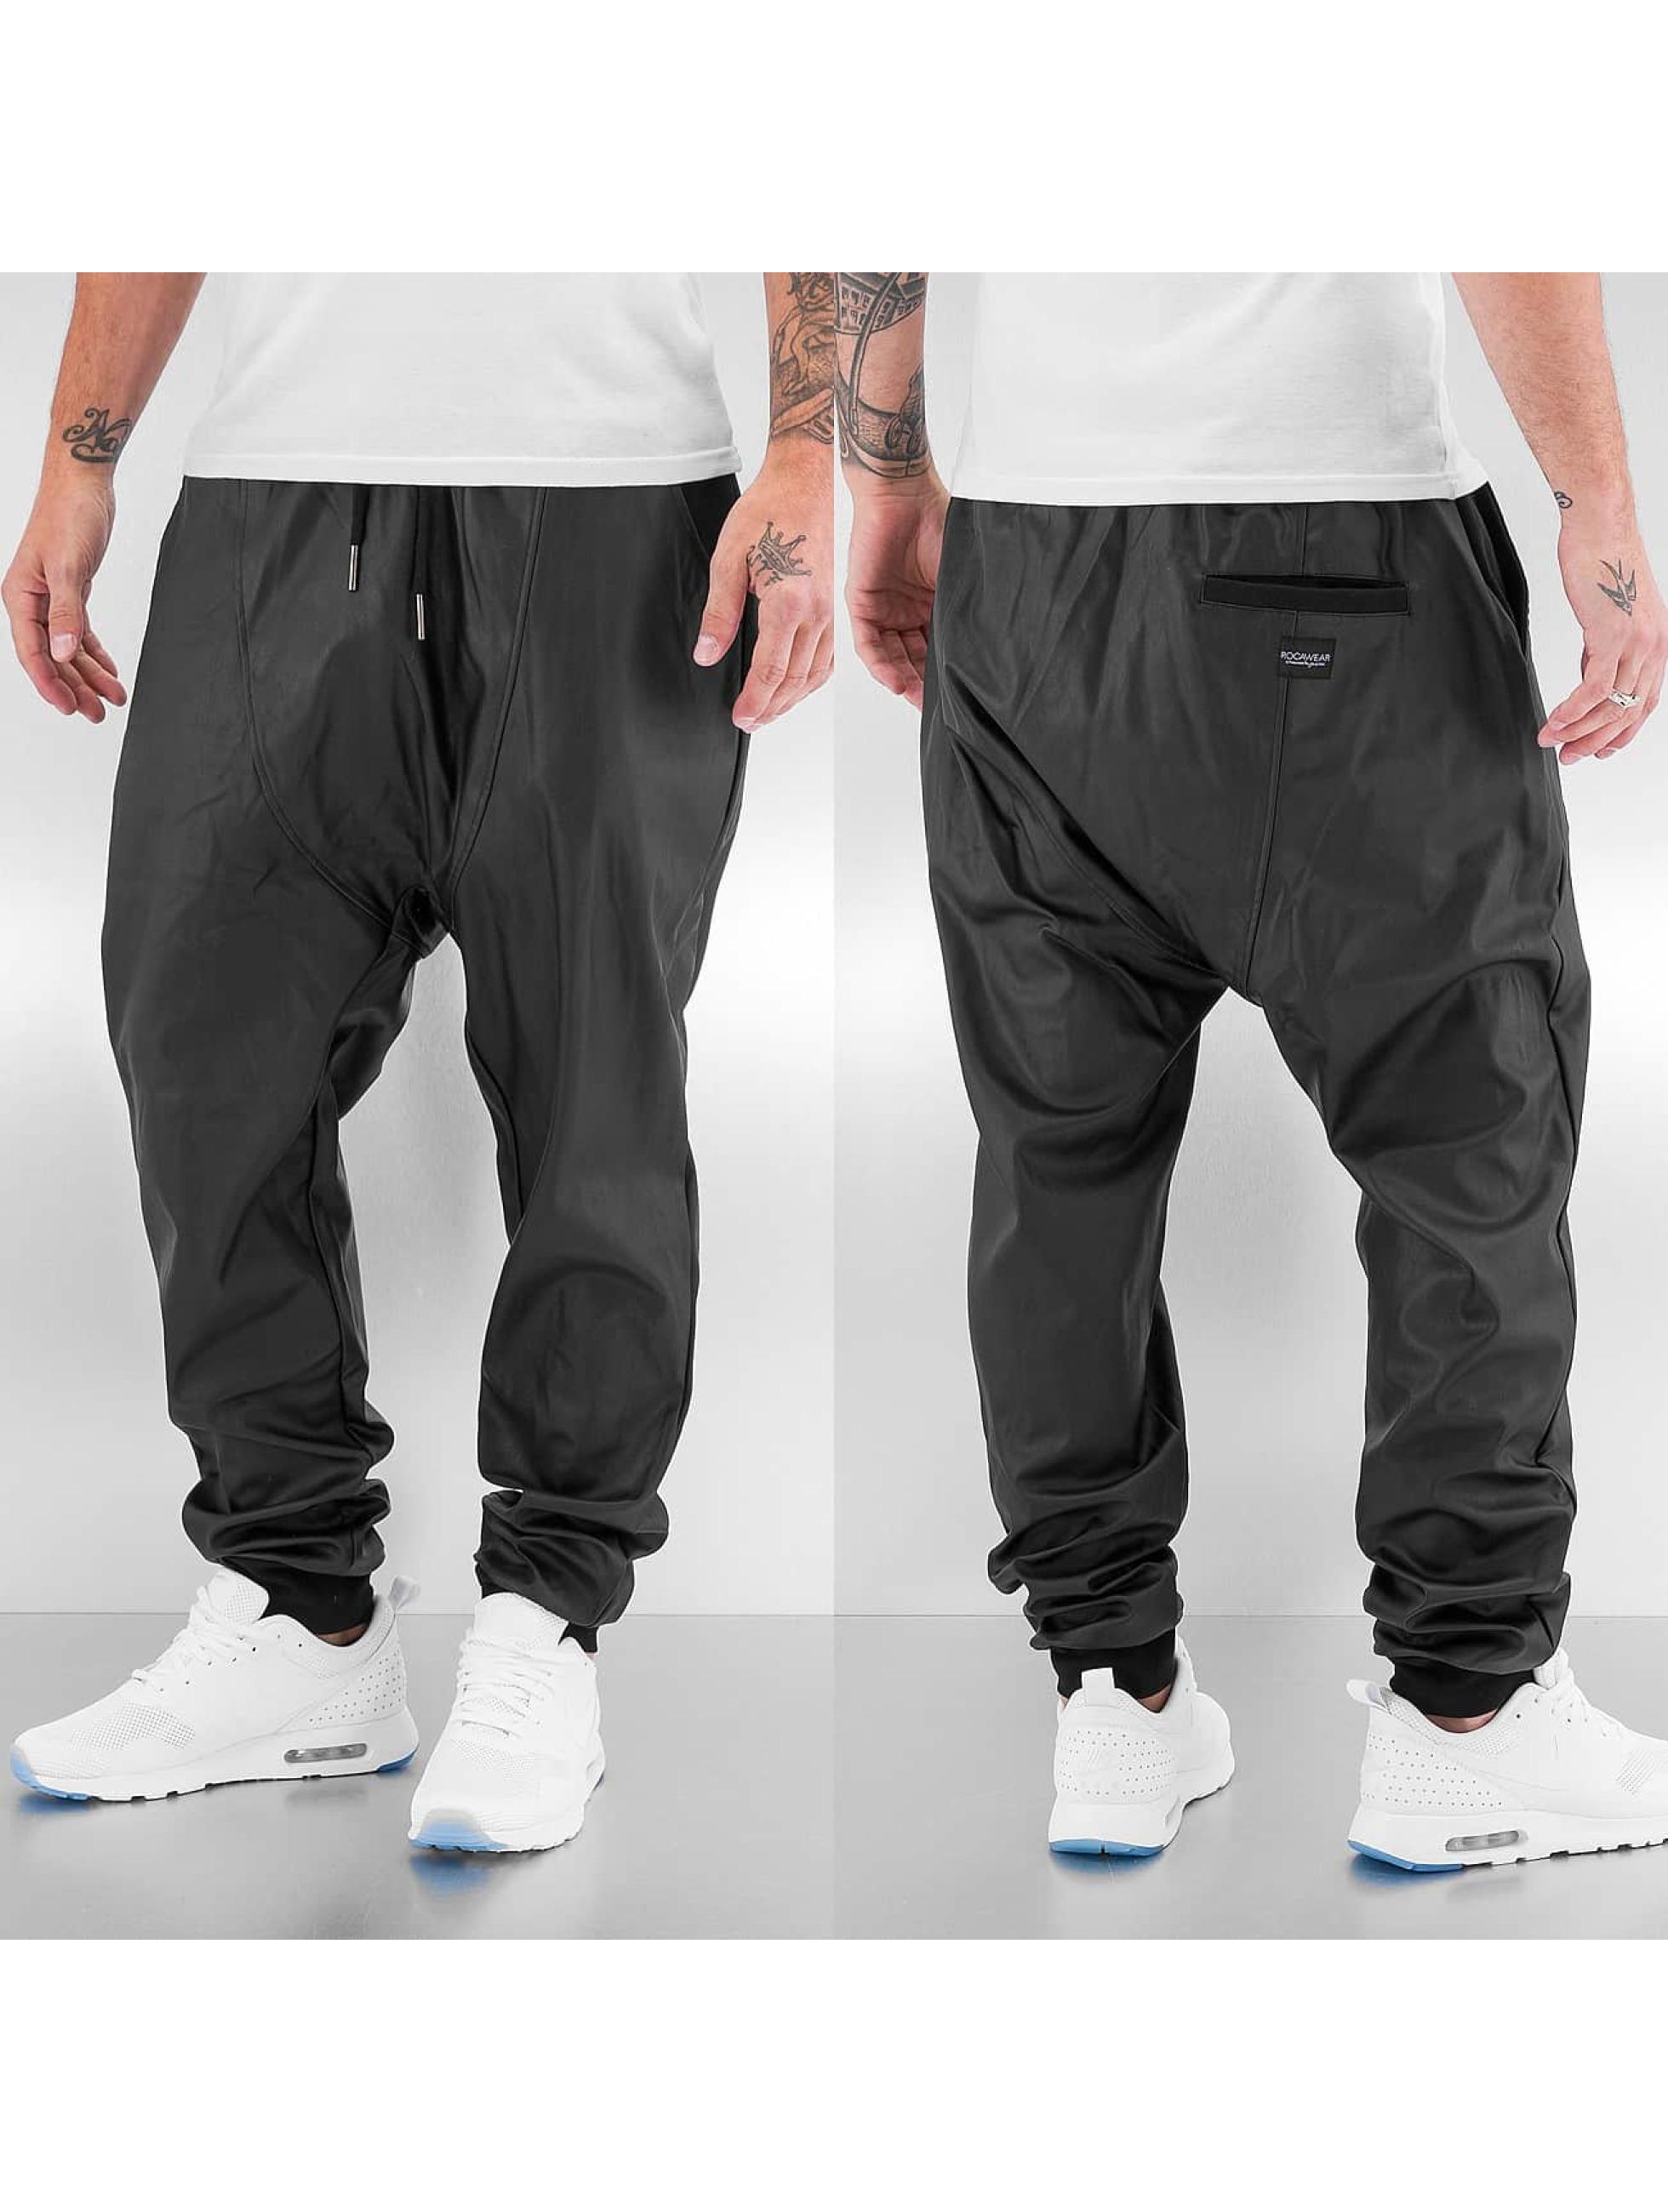 Rocawear Jogginghose Hammer PU Fleece schwarz